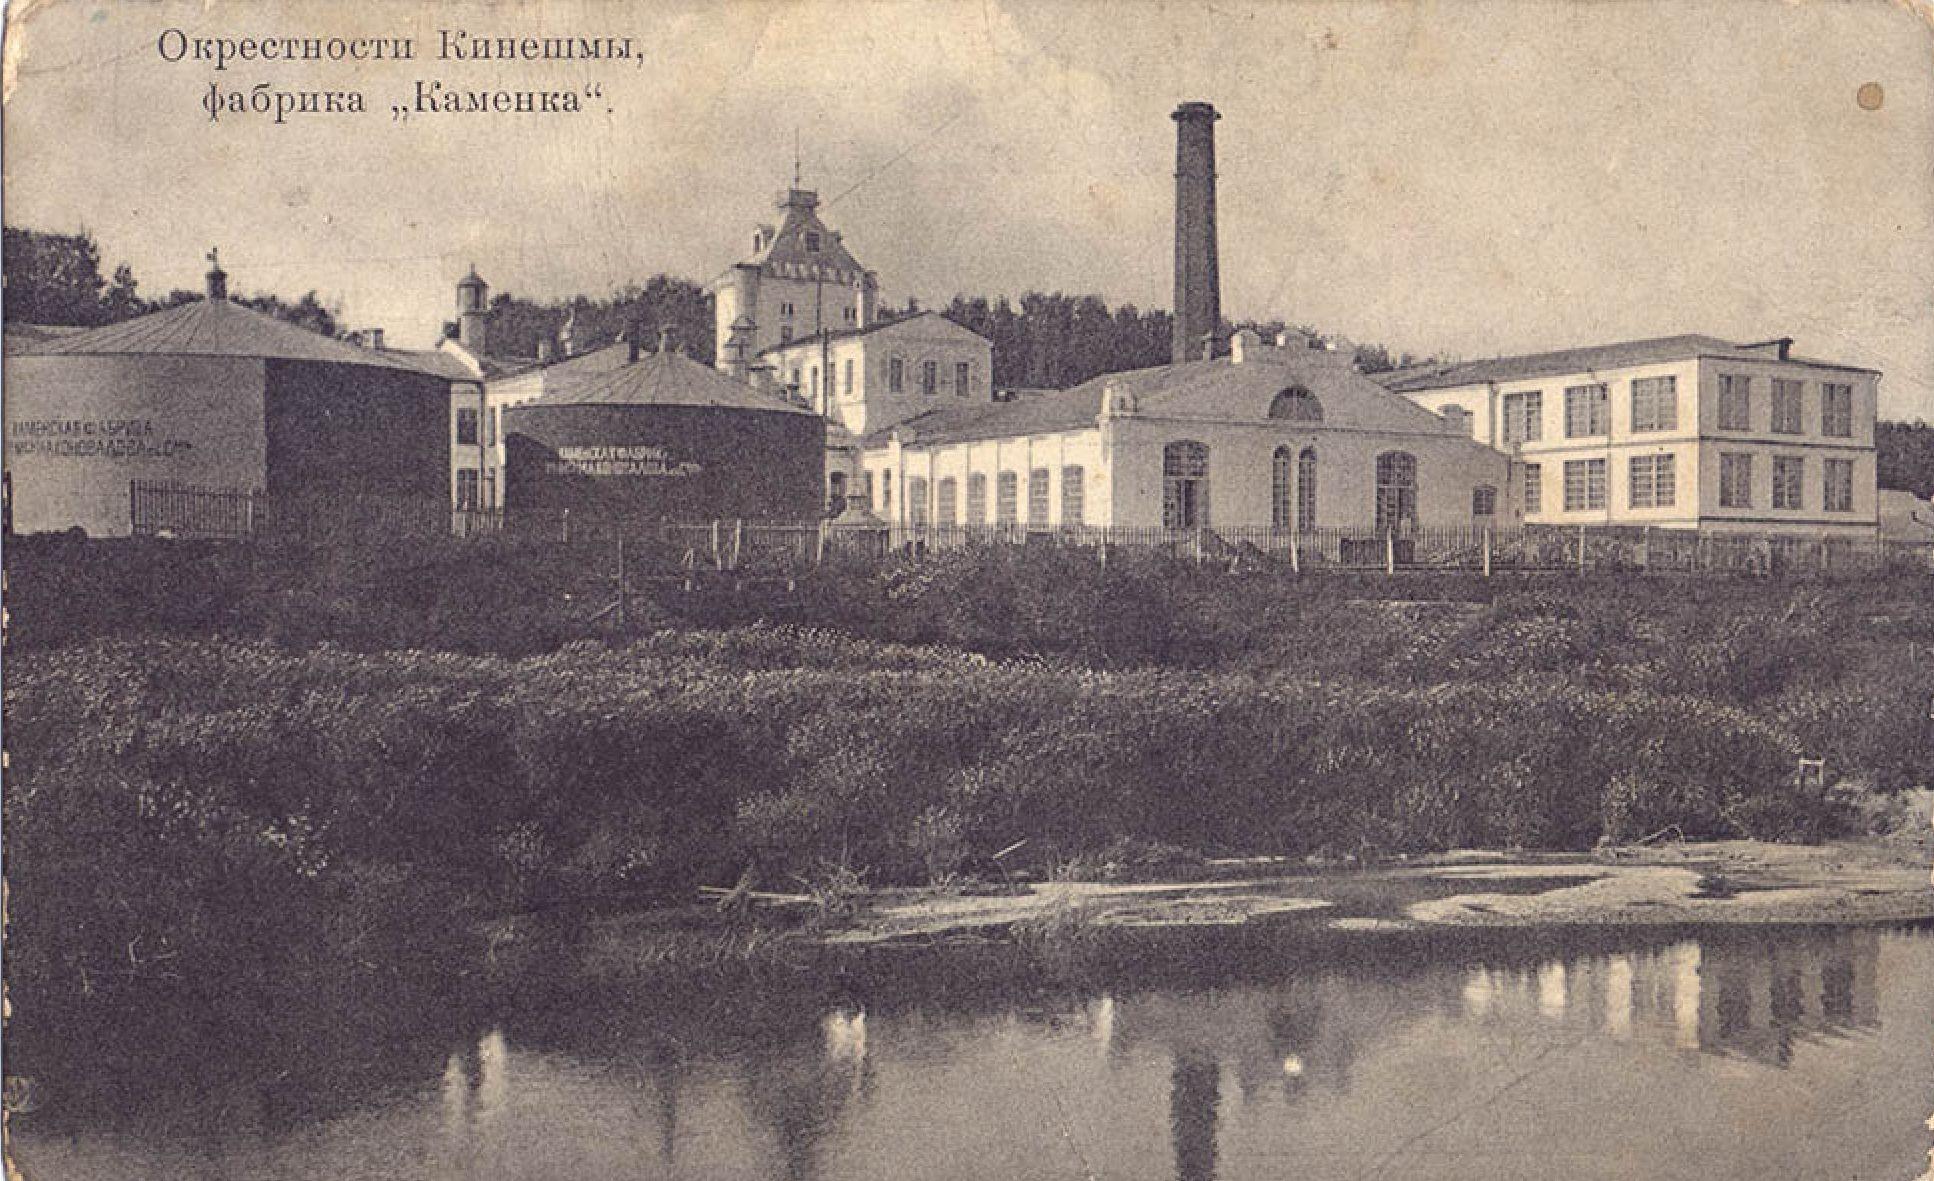 Окрестности Кинешмы. Фабрика «Каменка»